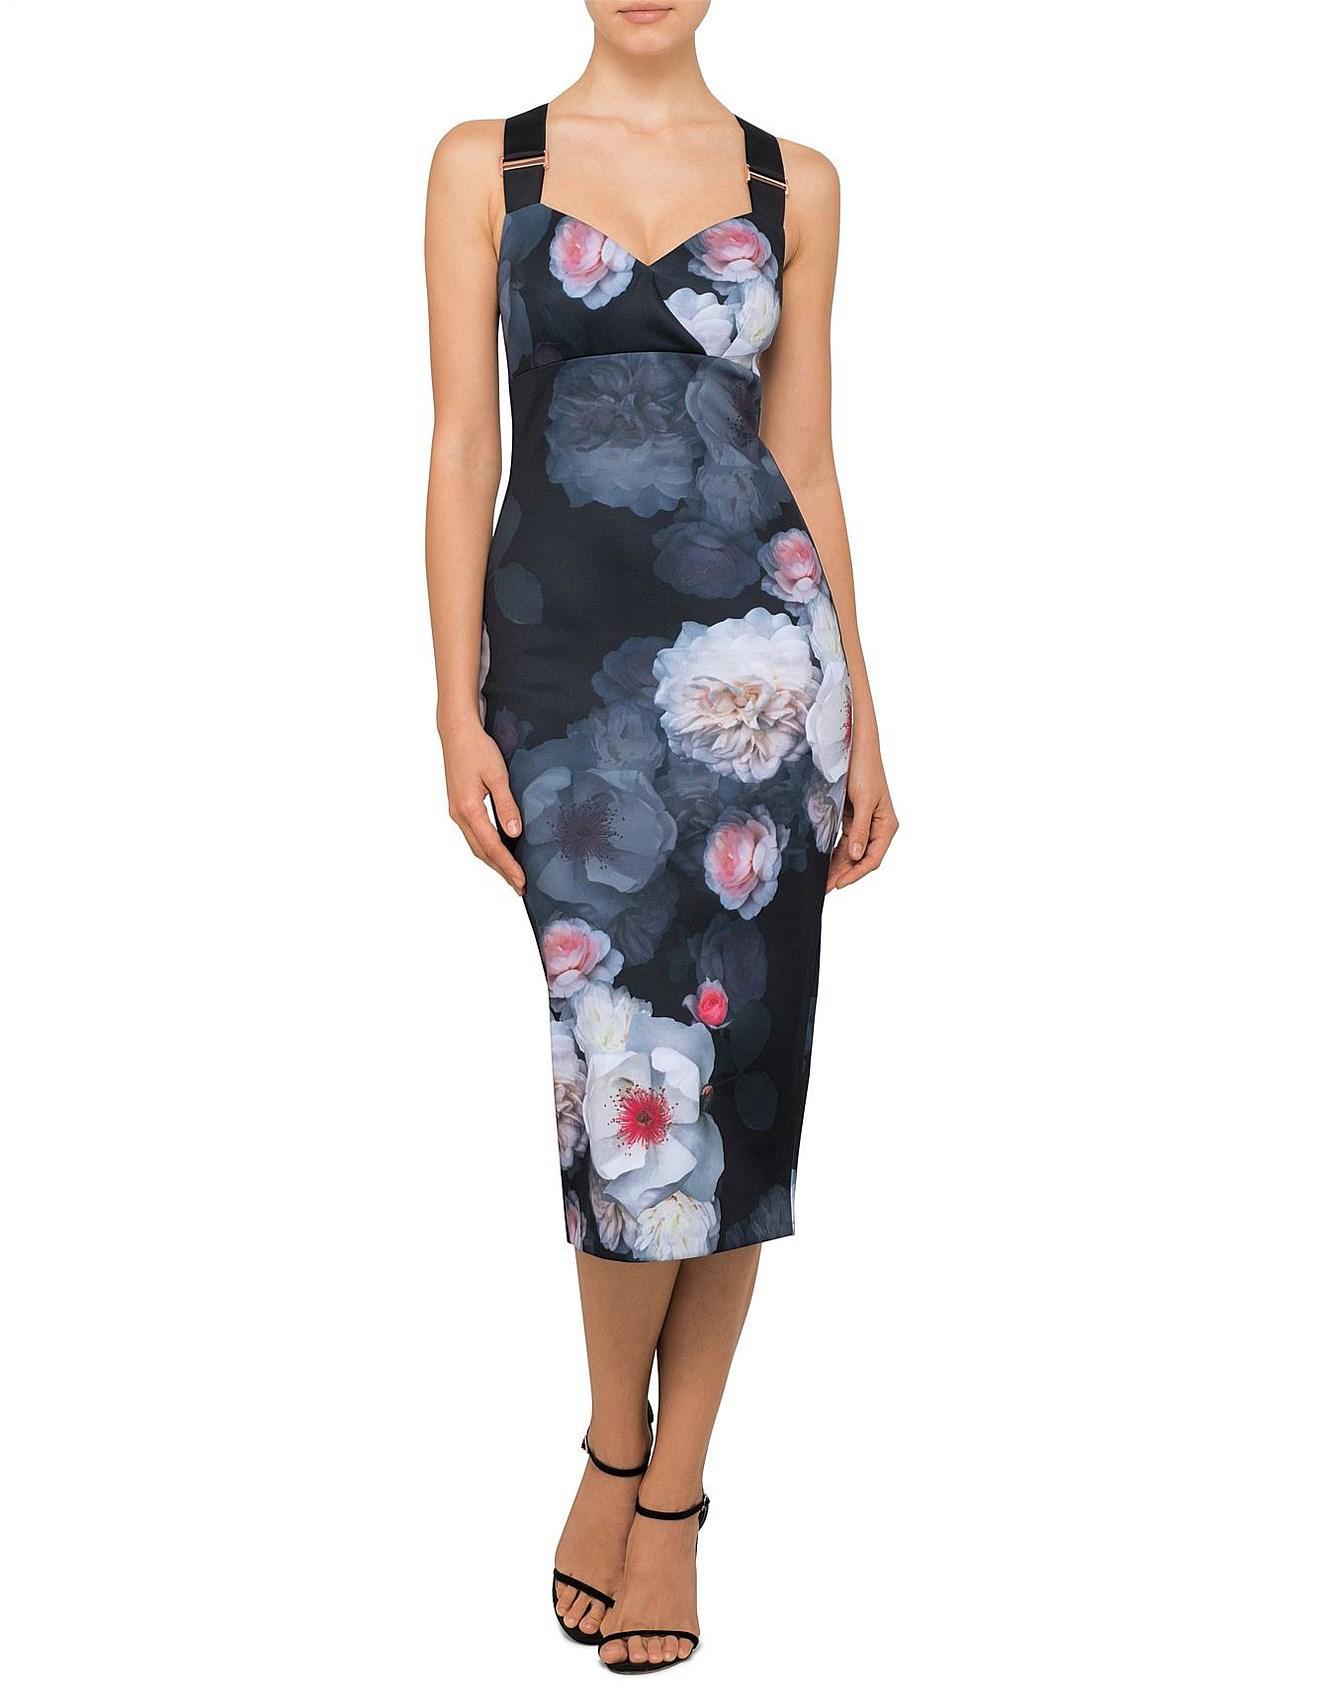 44e99e6a7896b9 Ted Baker Teeki Chelsea Print Bodycon Dress in Black - Lyst